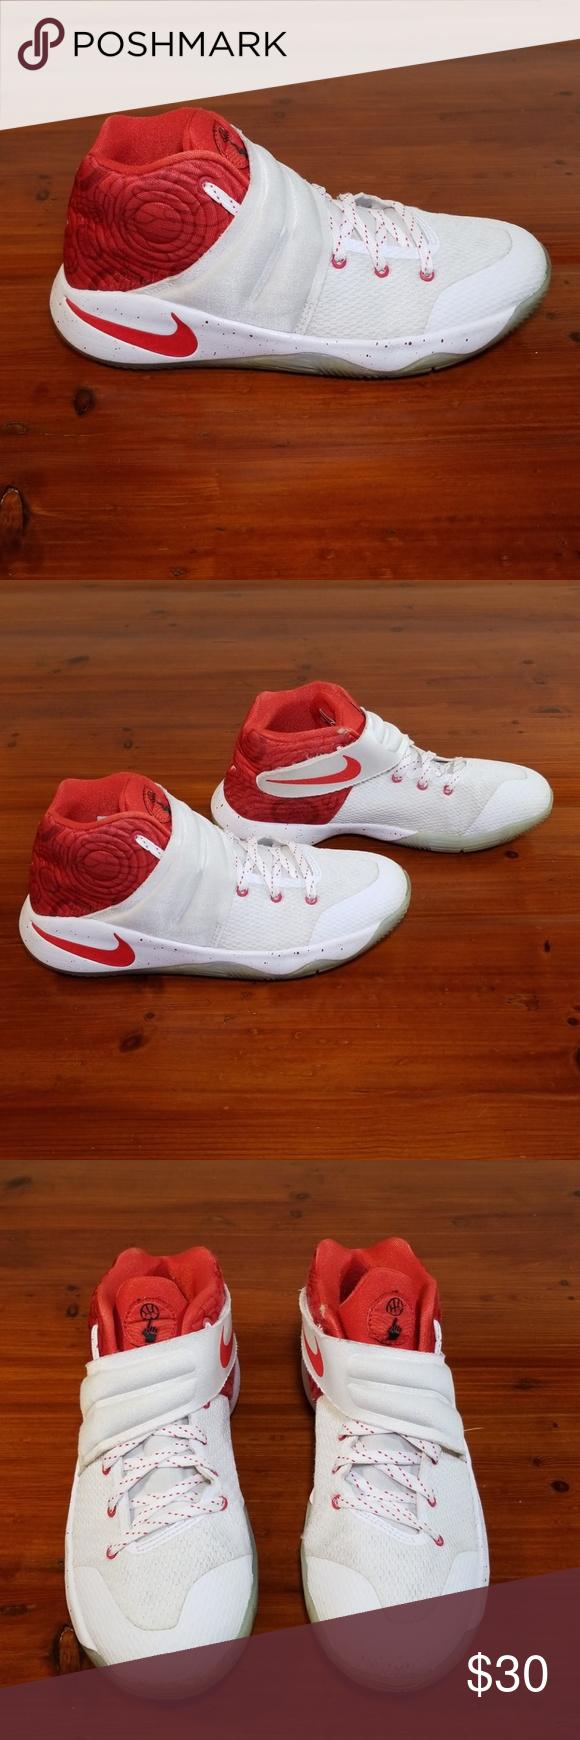 a7914ac59ac Nike Kyrie 2 GS Size 5.5Y Nike Kyrie 2 GS 826673-166 11 11 15 ...